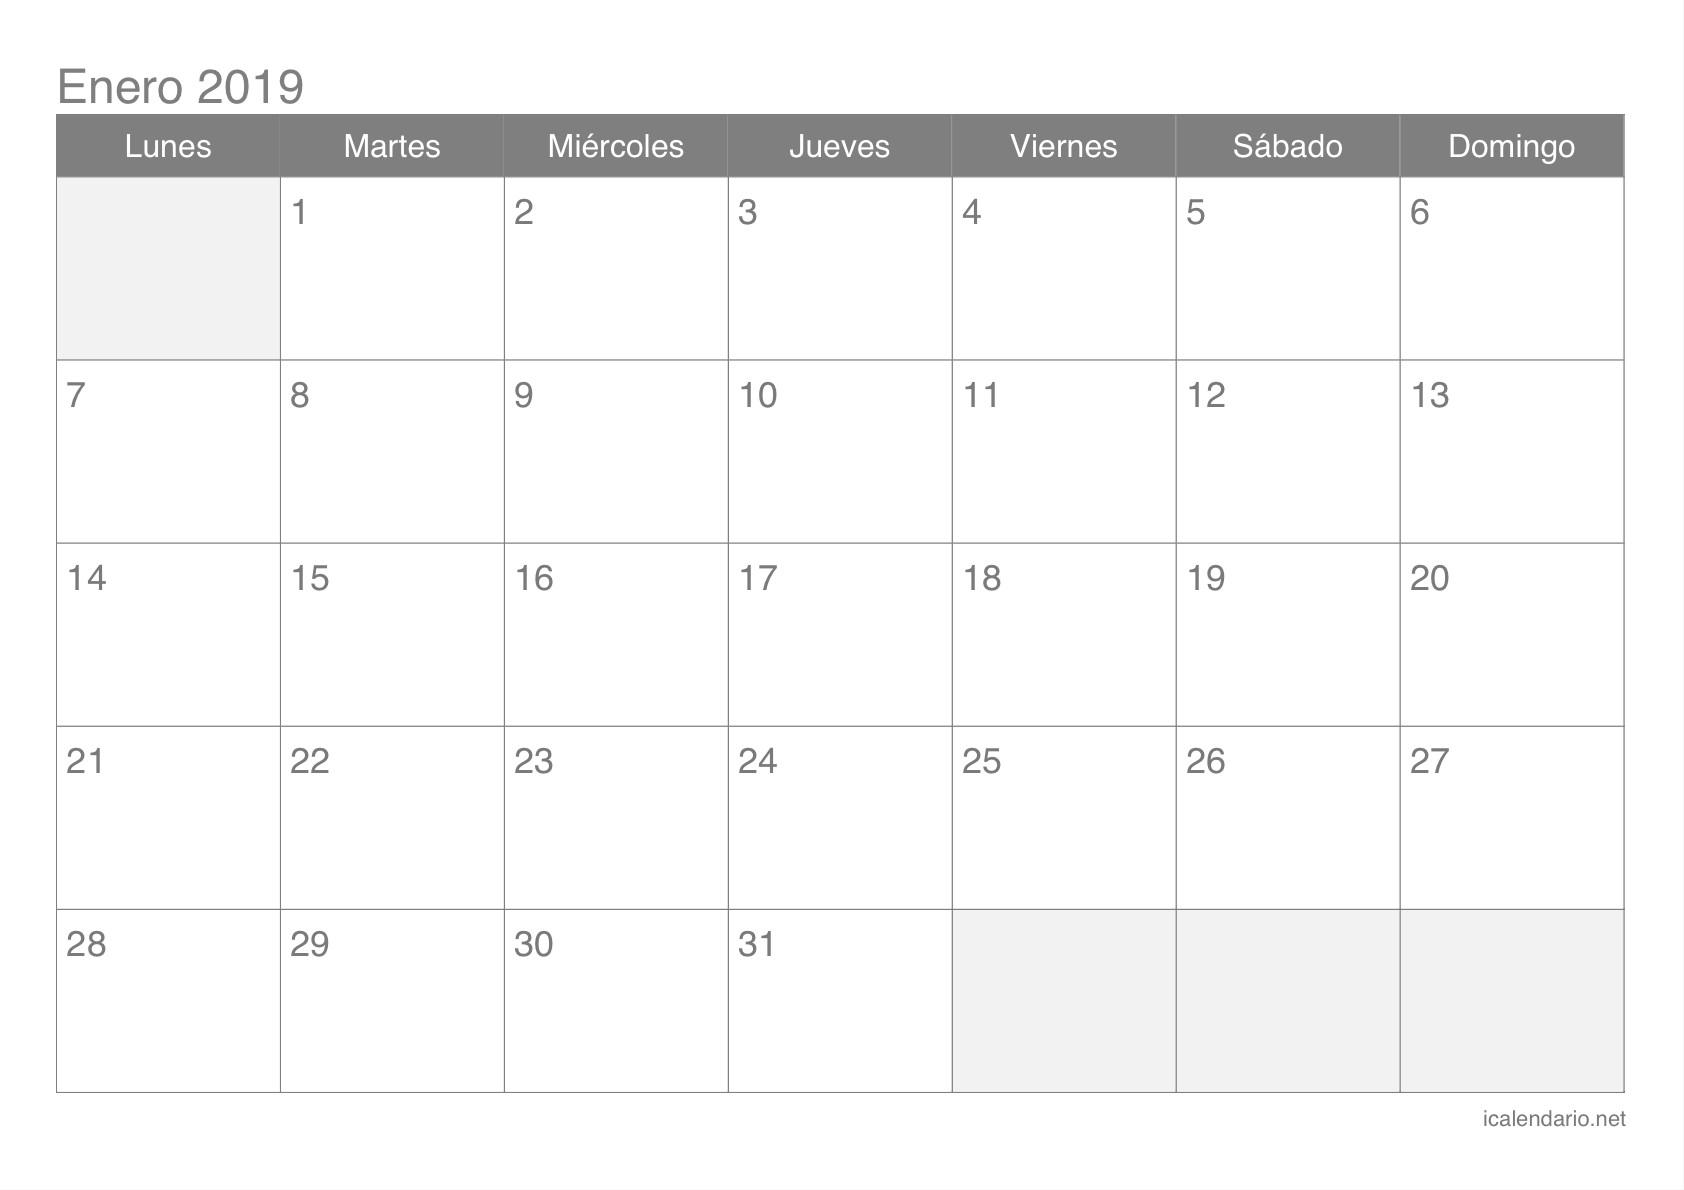 Calendario Diciembre 2019 Argentina Recientes Calendario Escolar 2018 2019 Más De 100 Plantillas E Imágenes Para Of Calendario Diciembre 2019 Argentina Más Recientemente Liberado El Row Vuelve A Revolucionar Ushua¯a Ibiza Este Miércoles 22 De Agosto